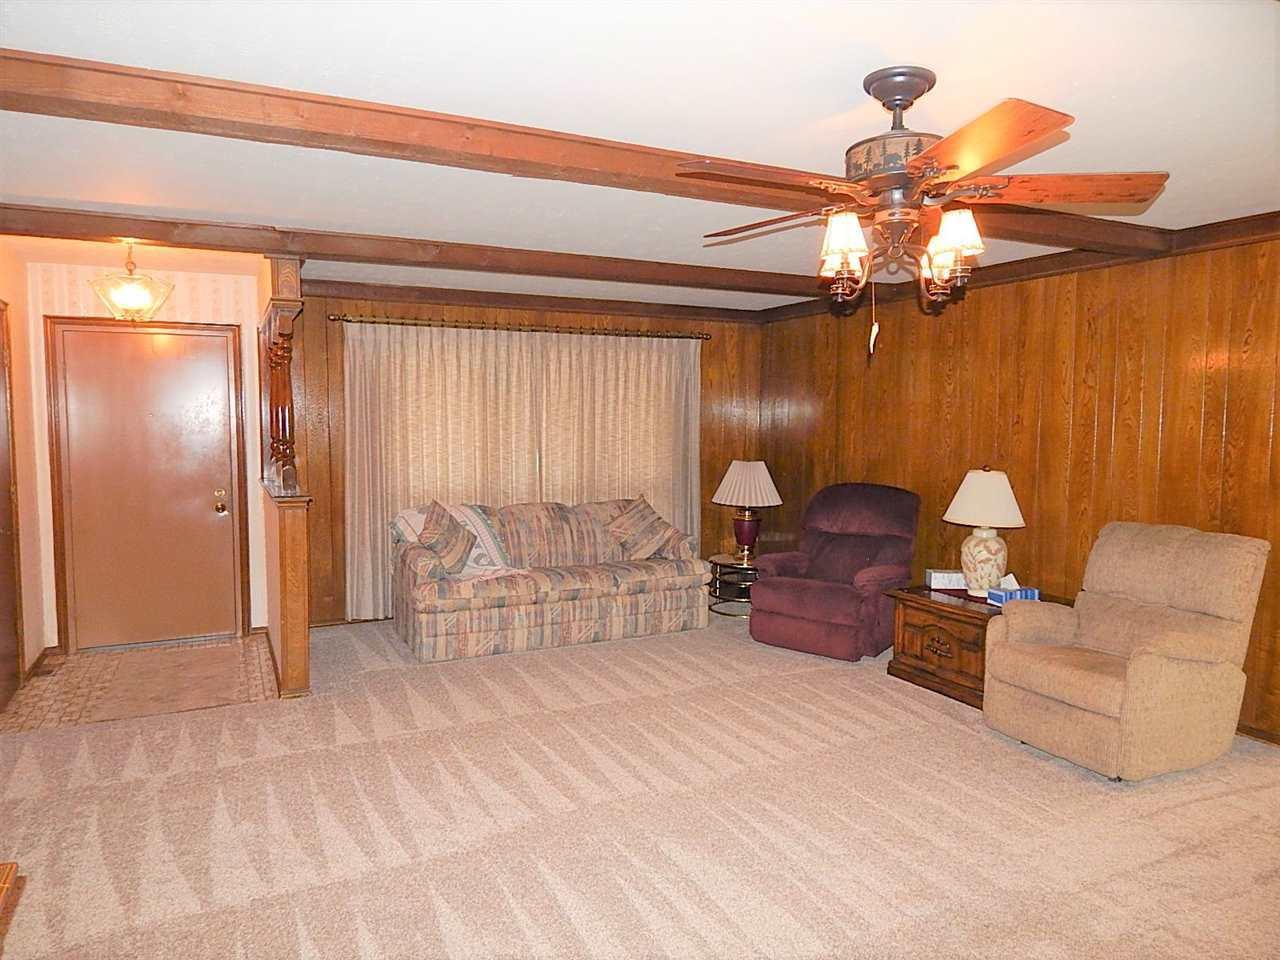 Sold Cross Sale W/ MLS | 2113 Berkshire Ponca City, OK 74604 2